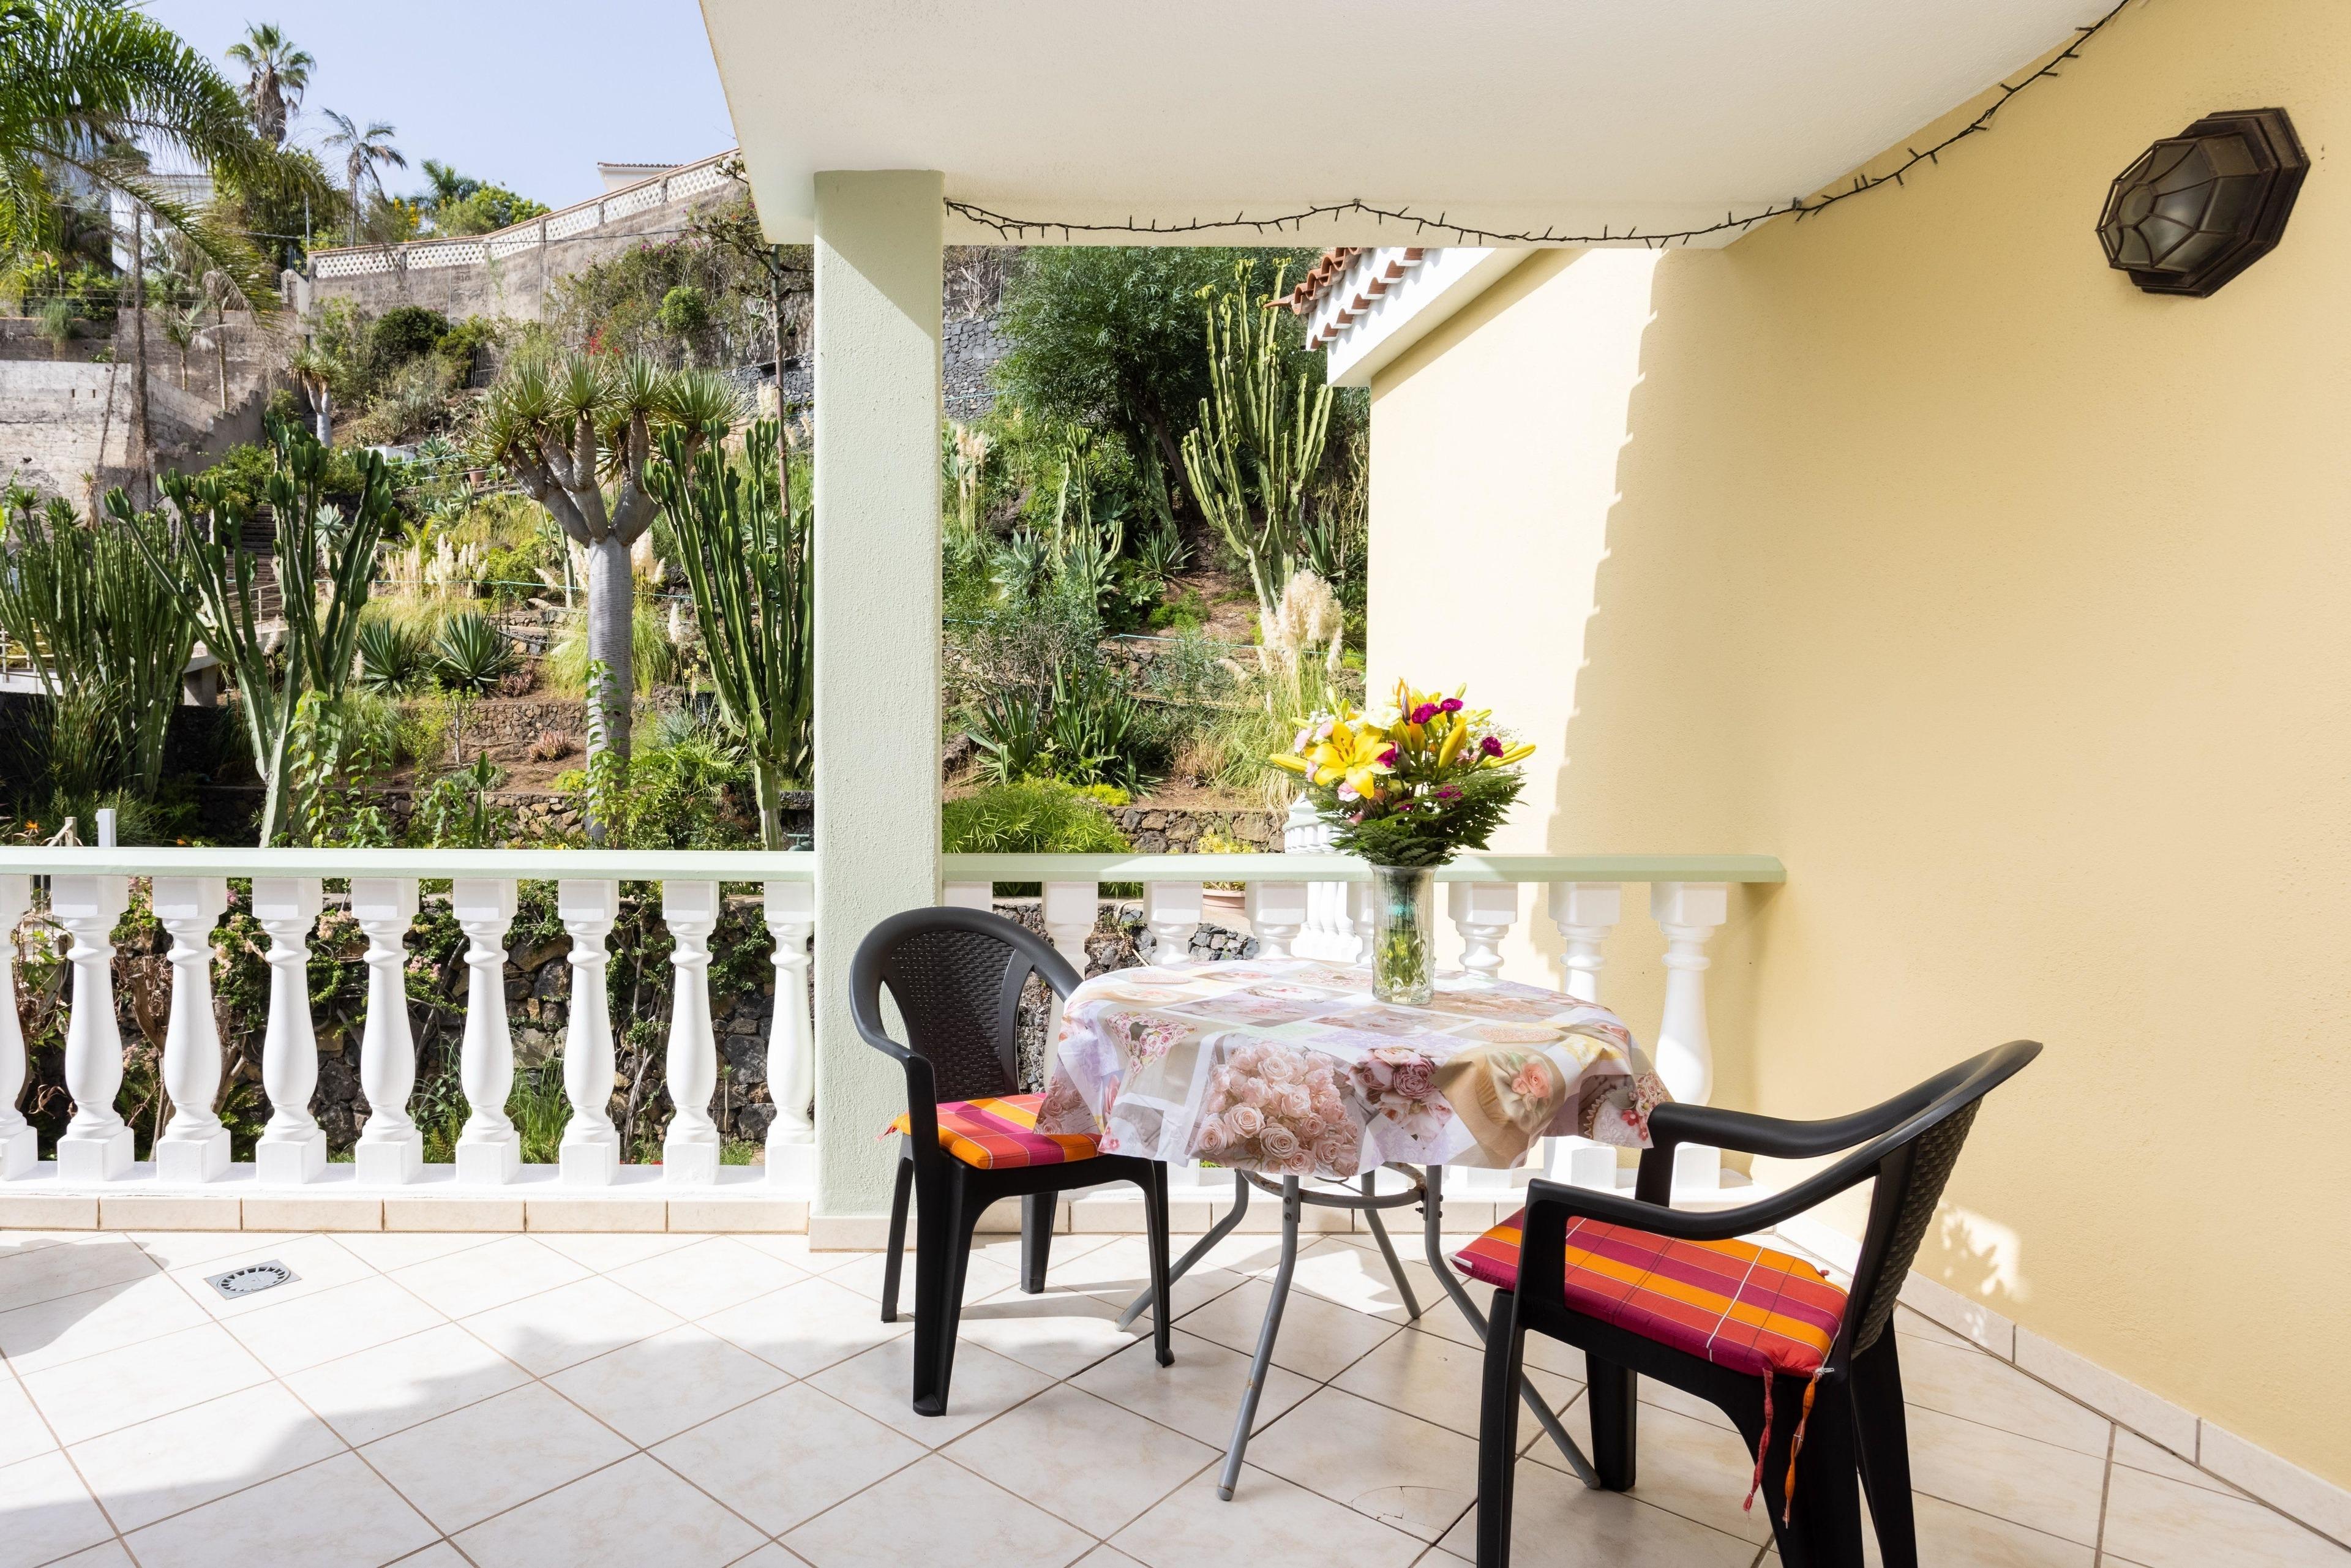 Appartement de vacances Fewo Atico Florasol, sehr ruhig direkt am Naturschutzgebiet, mit Pool, 2 Terrassen, Grill, (2492983), Santa Ursula, Ténérife, Iles Canaries, Espagne, image 13